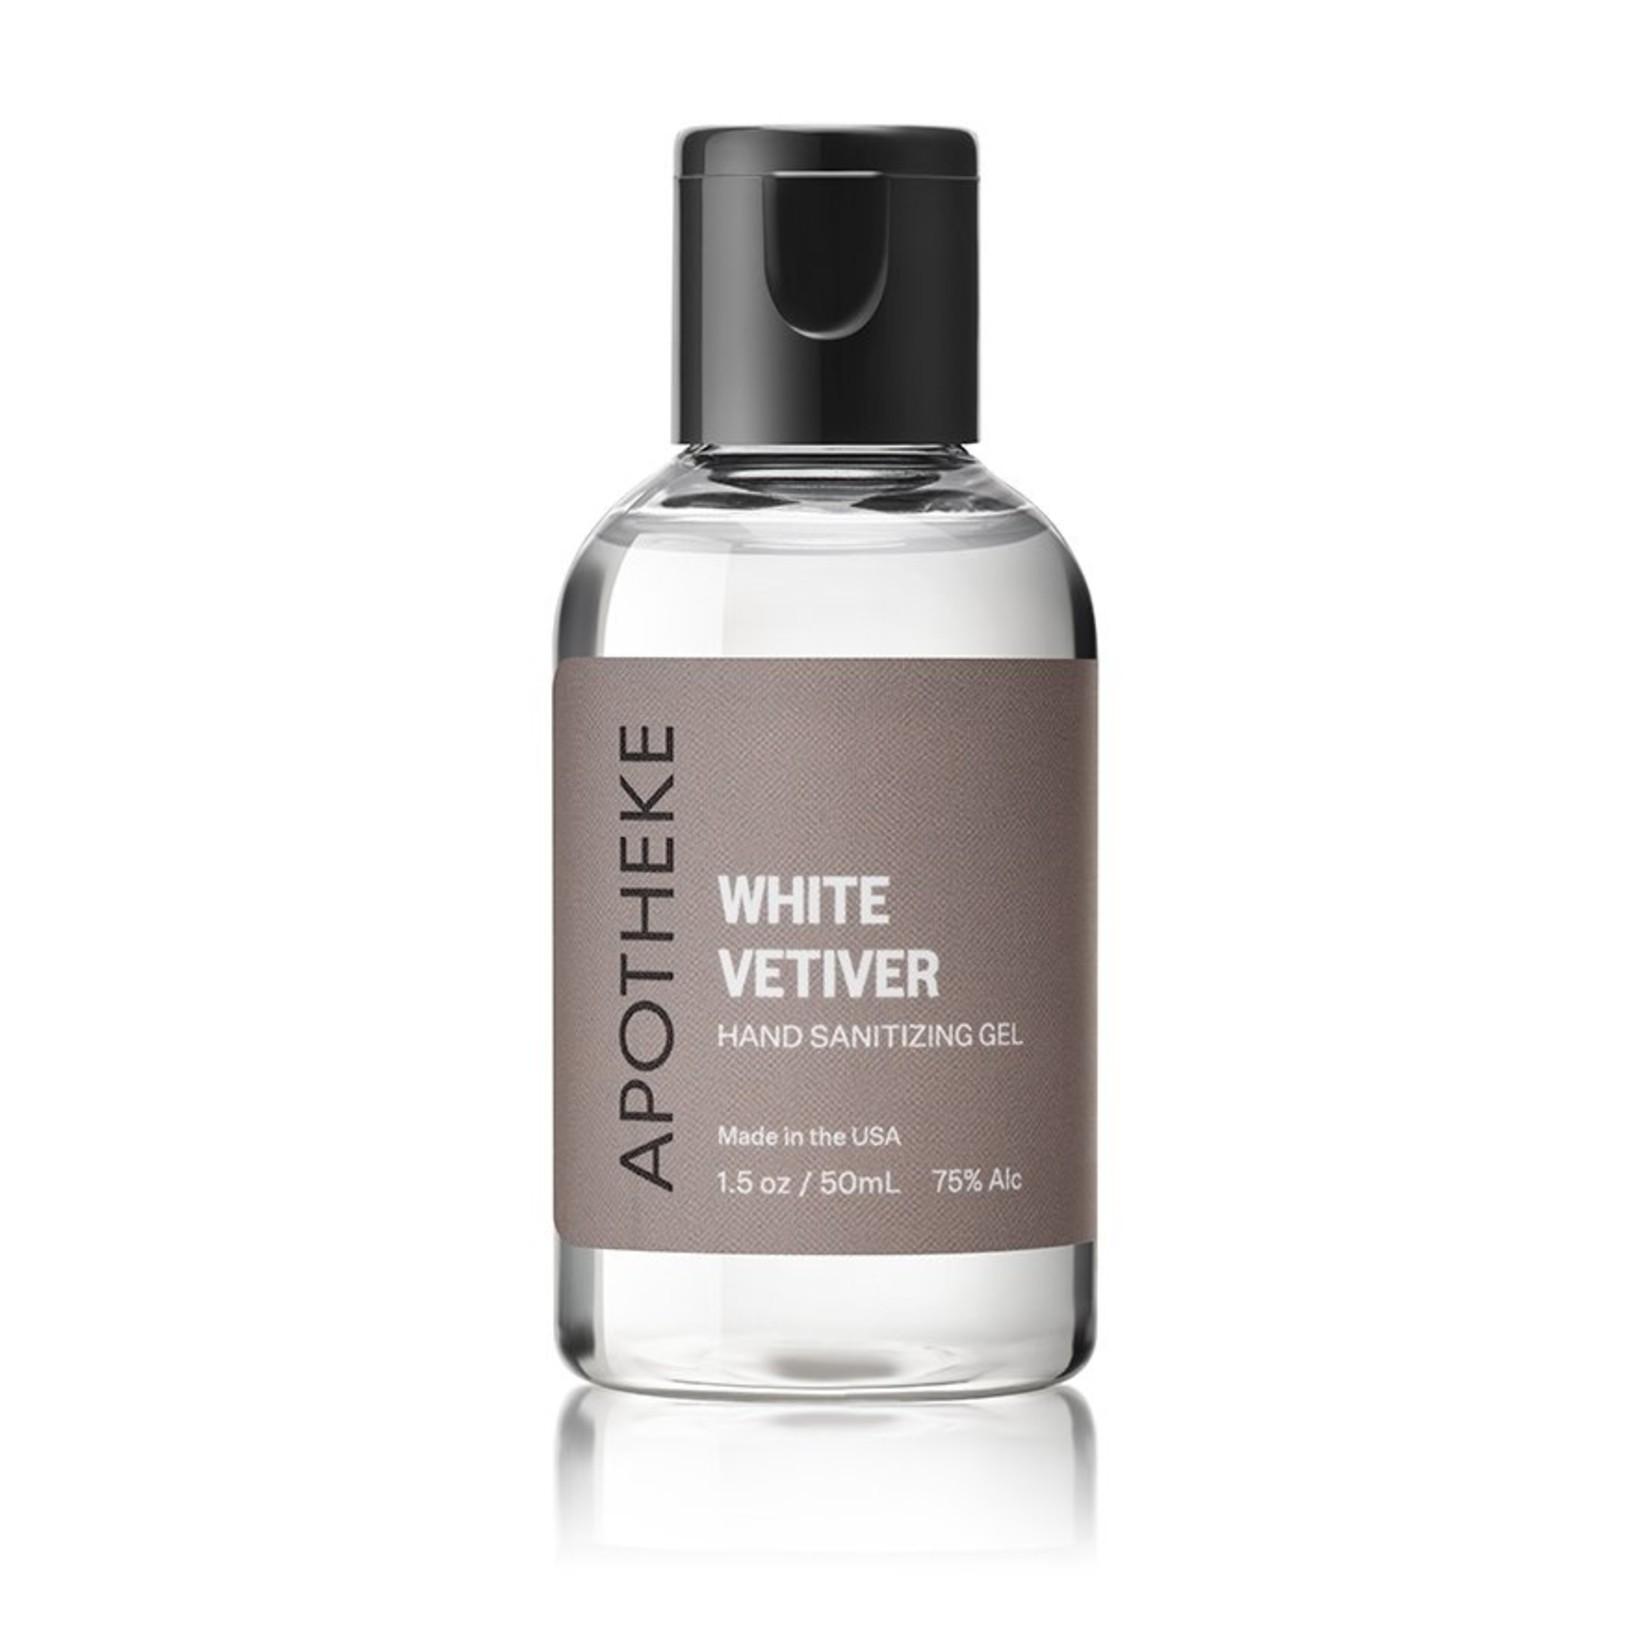 Apotheke White Vetiver Hand Sanitizer